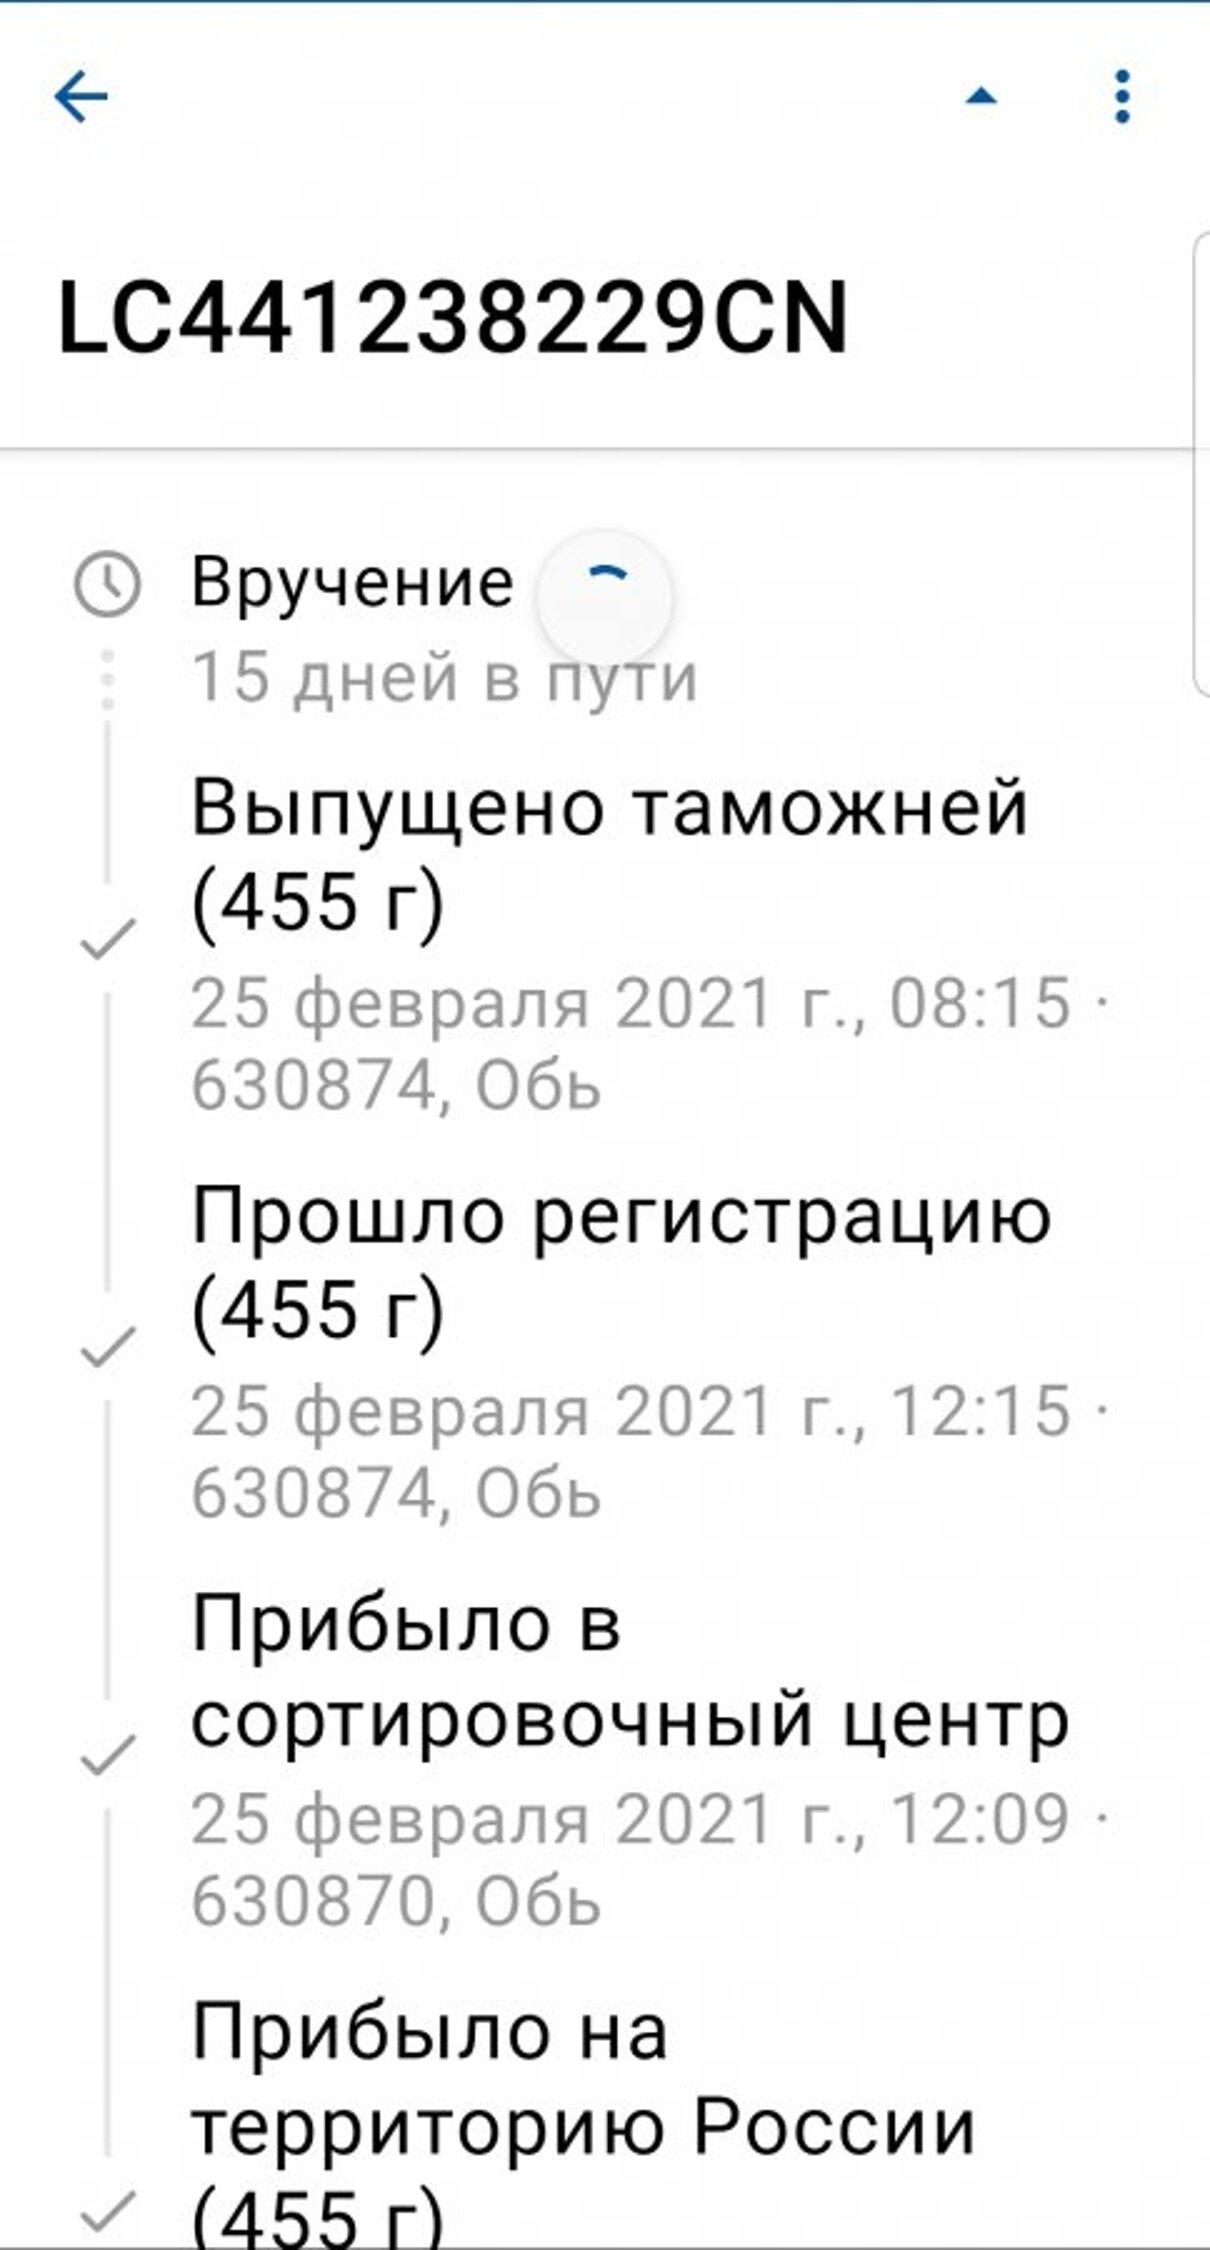 Жалоба-отзыв: Толмачёво АОПП ММПО PI-1 - Пропала посылка.  Фото №1